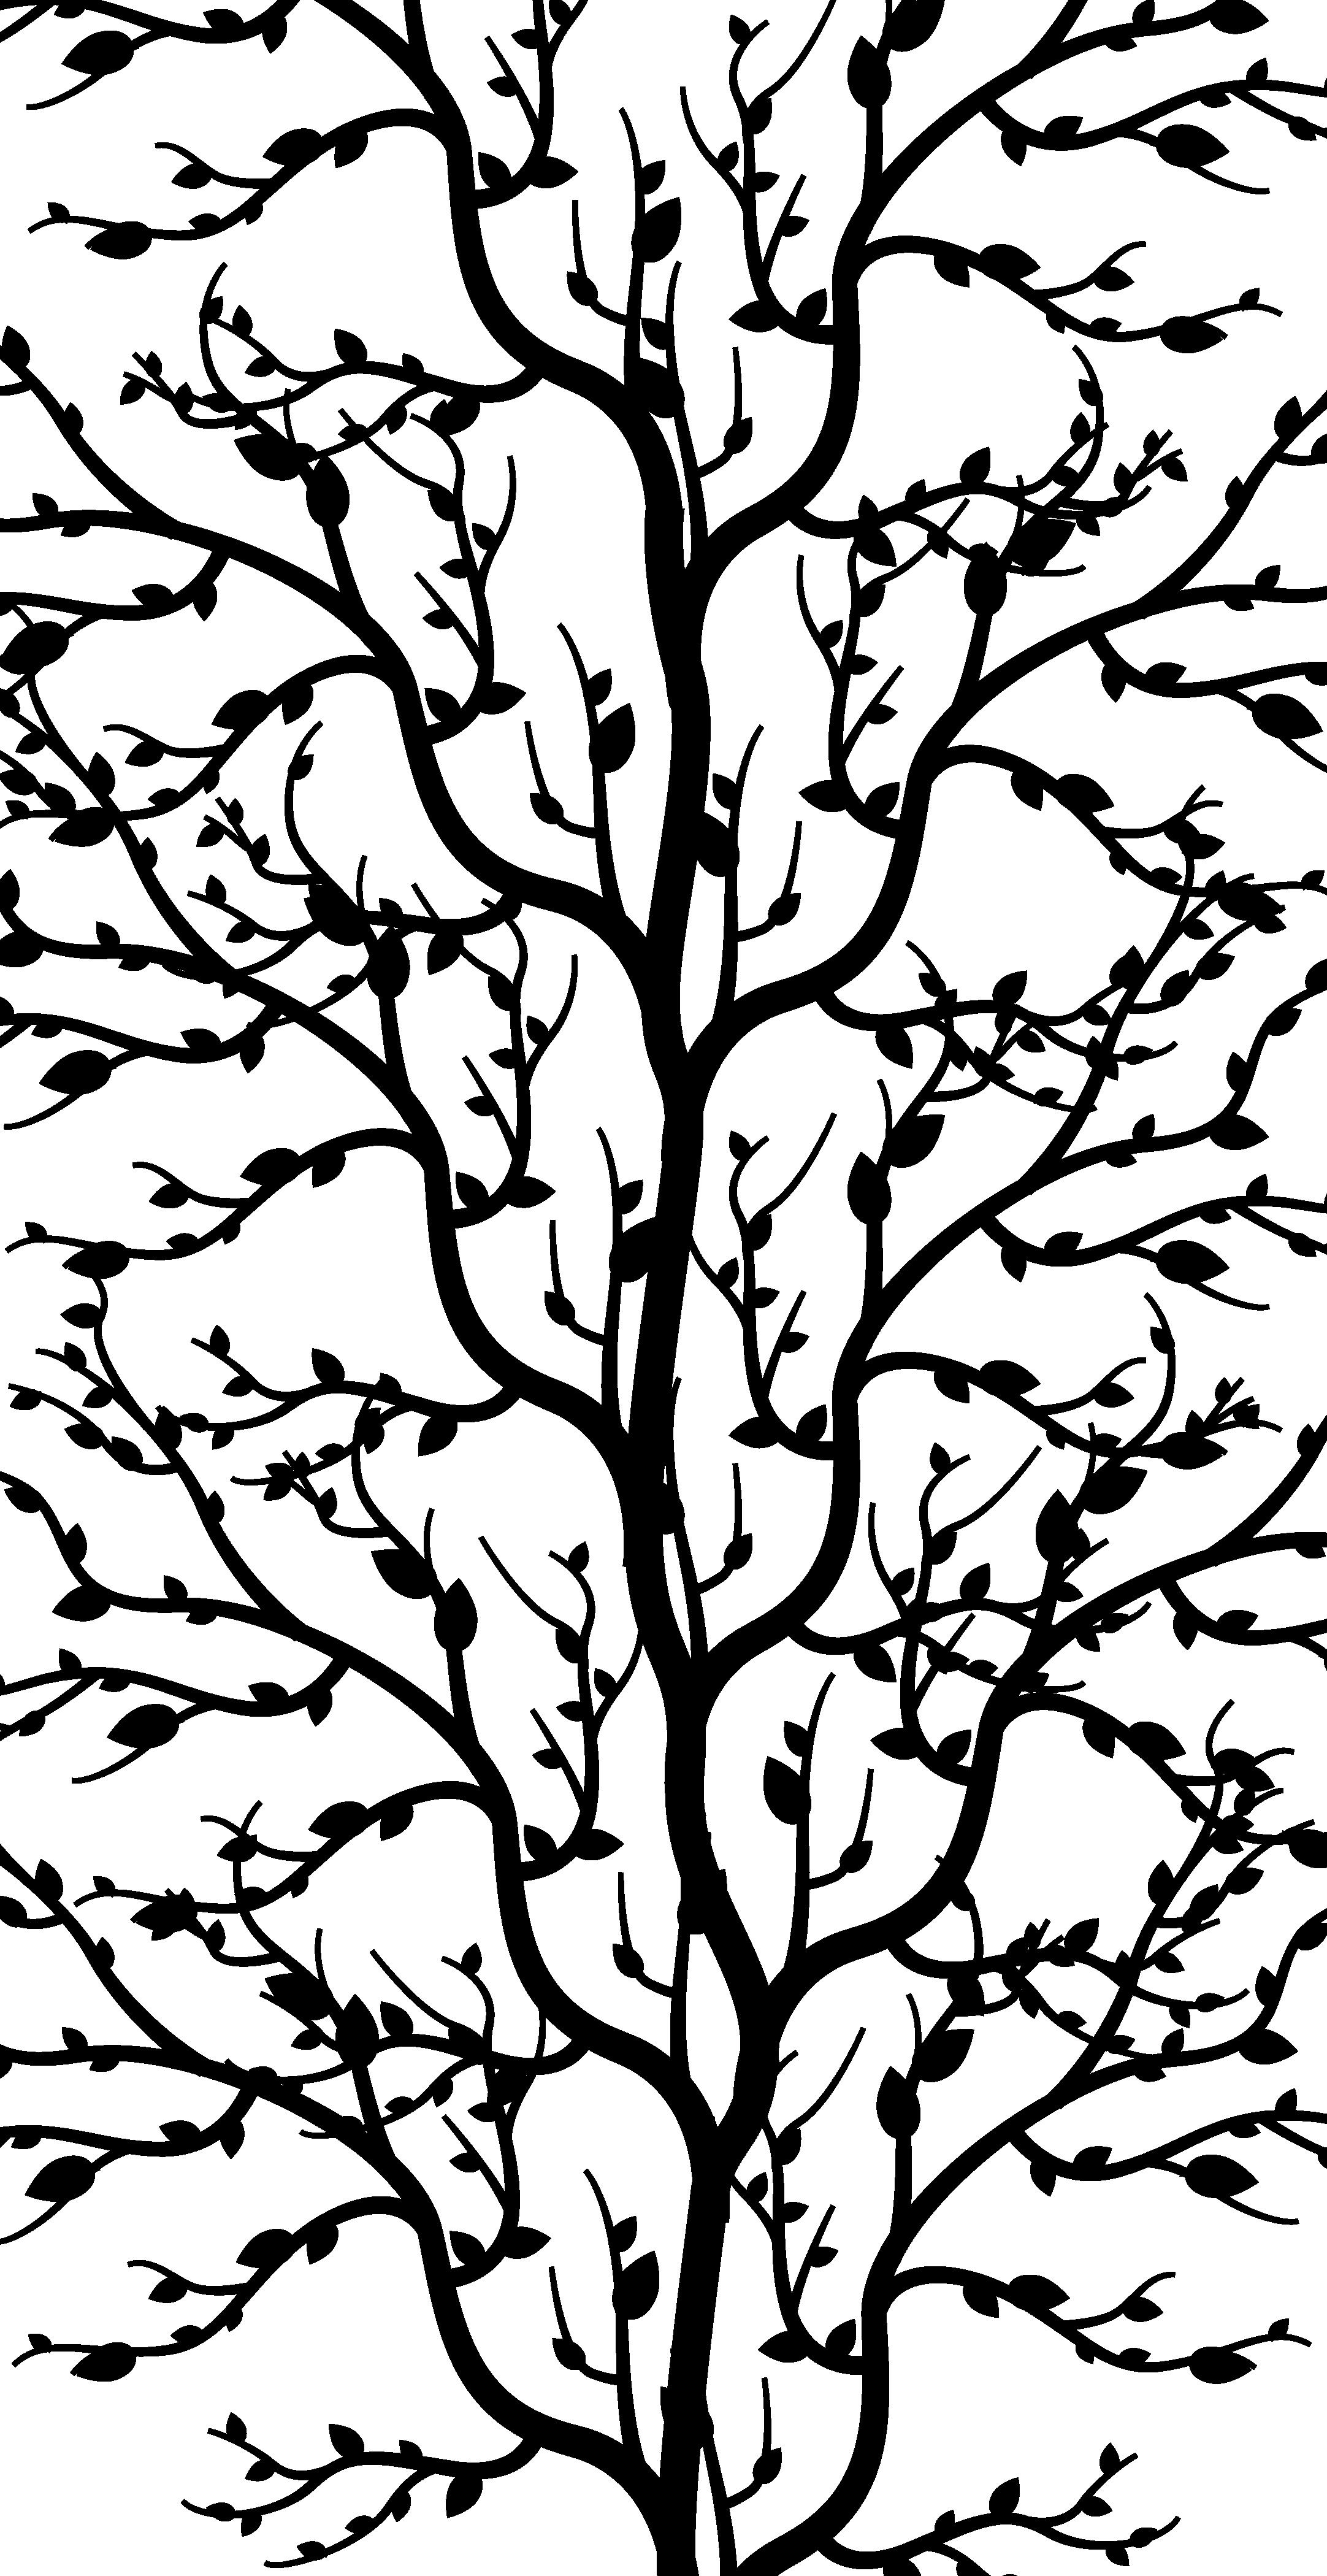 TenStickers. αυτοκόλλητο ντους κλαδιά δέντρων. κλαδιά δέντρου ντους διακοσμητικό πλαίσιο για να διακοσμήσει την πόρτα ενός χώρου ντους. διατίθεται σε διάφορα χρώματα και προσαρμόσιμο σε μέγεθος.